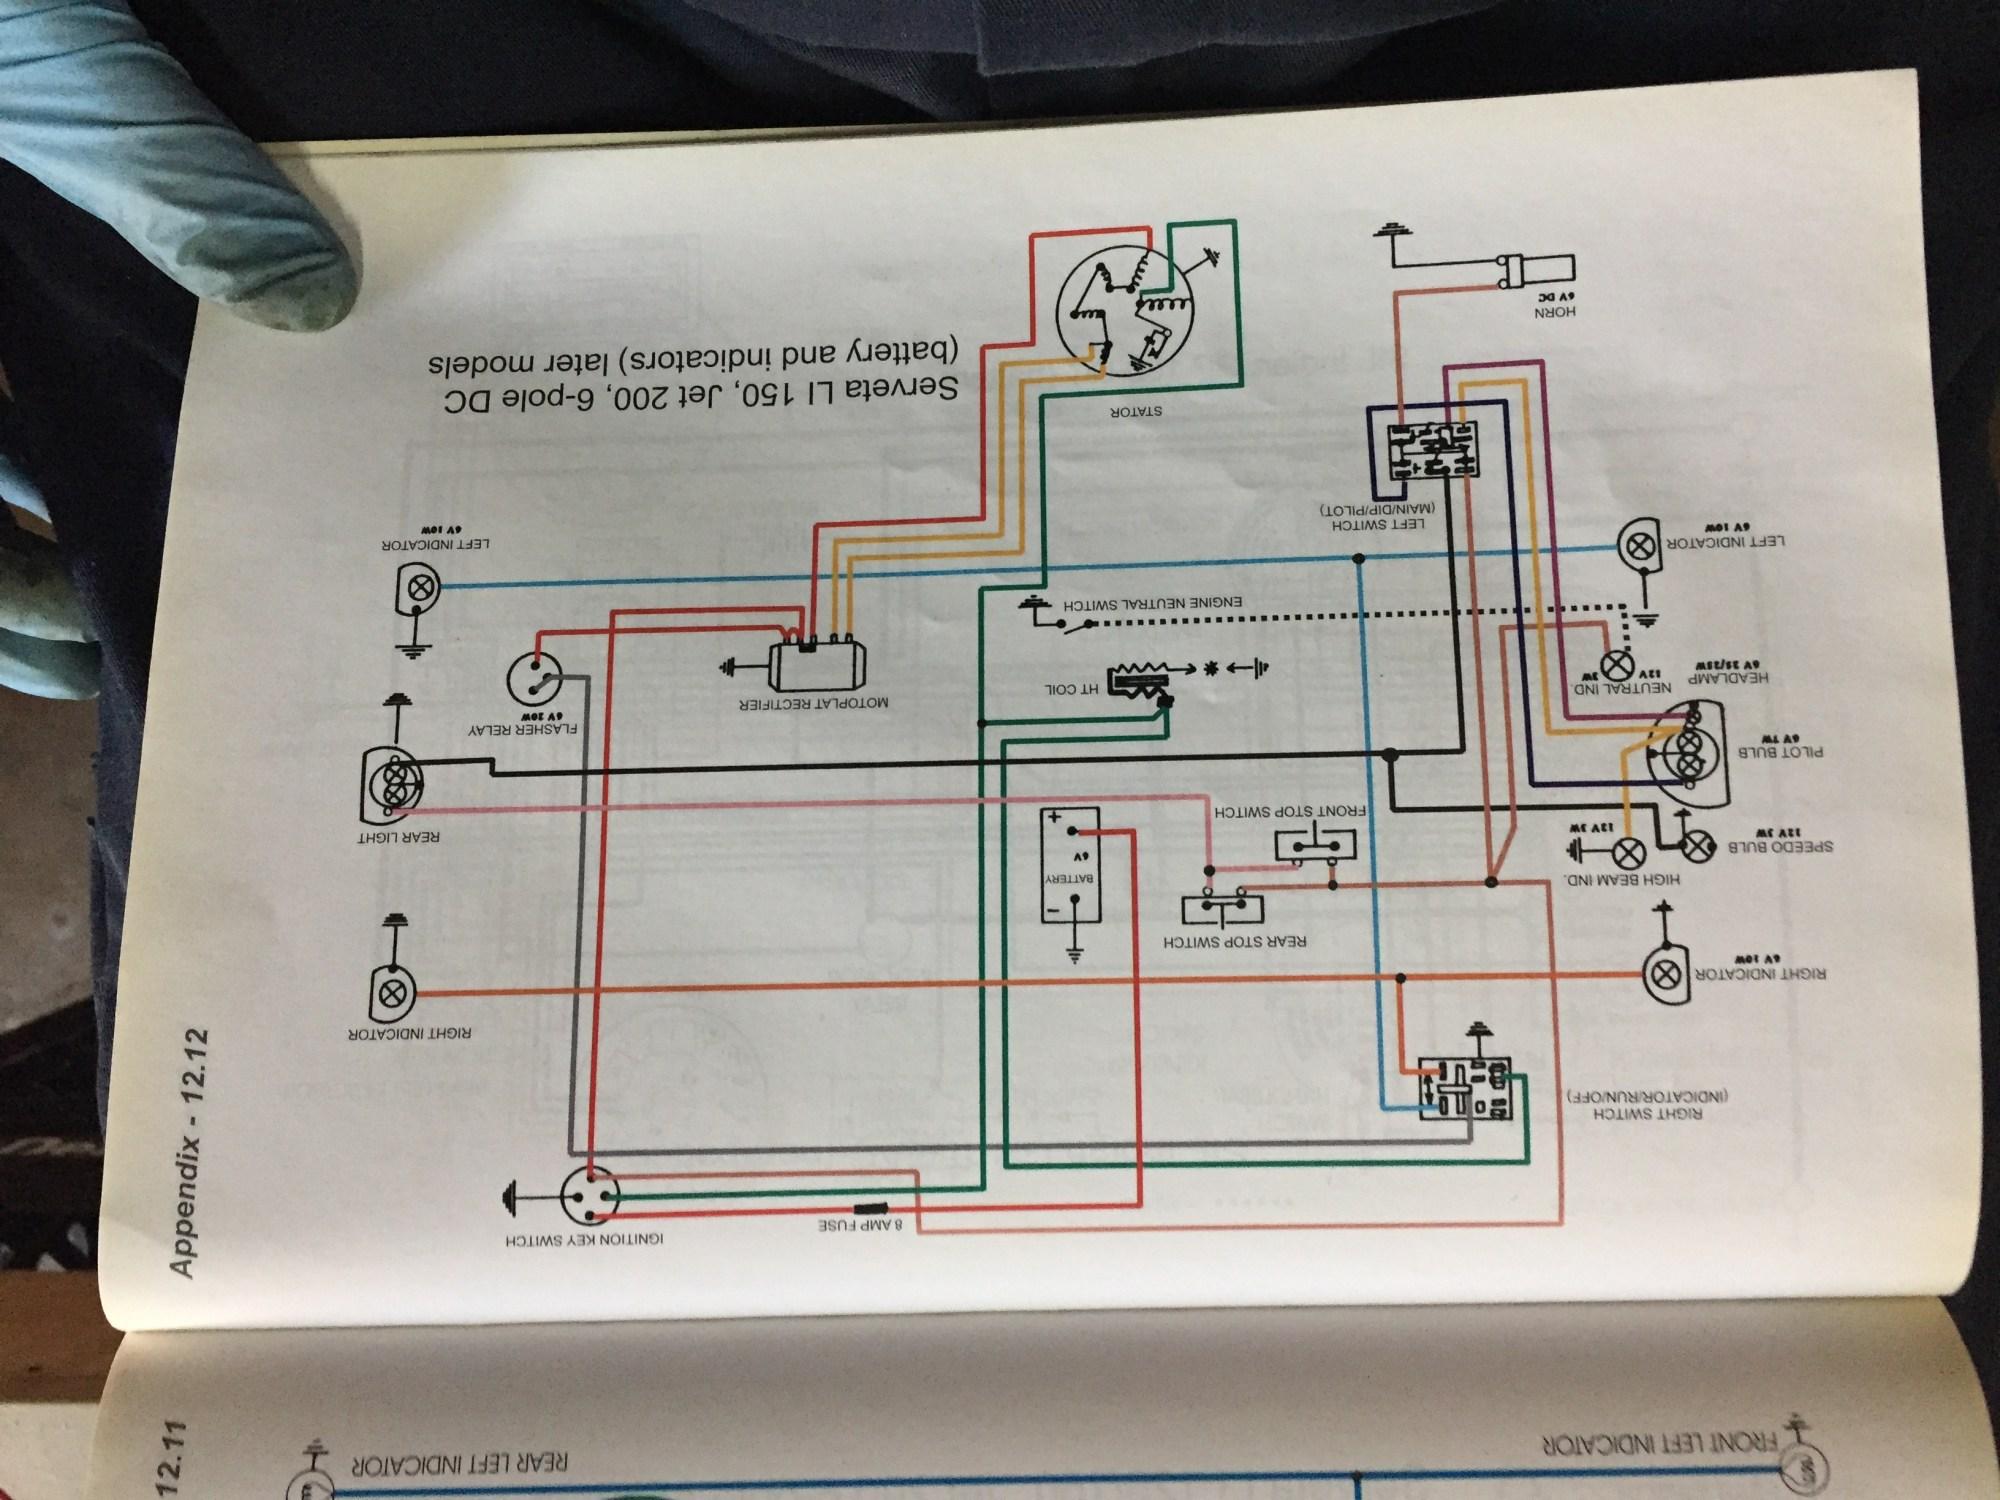 hight resolution of lambretta 12v ac wiring diagram simple wiring schema lighted rocker switch wiring diagram lambretta 12v ac wiring diagram